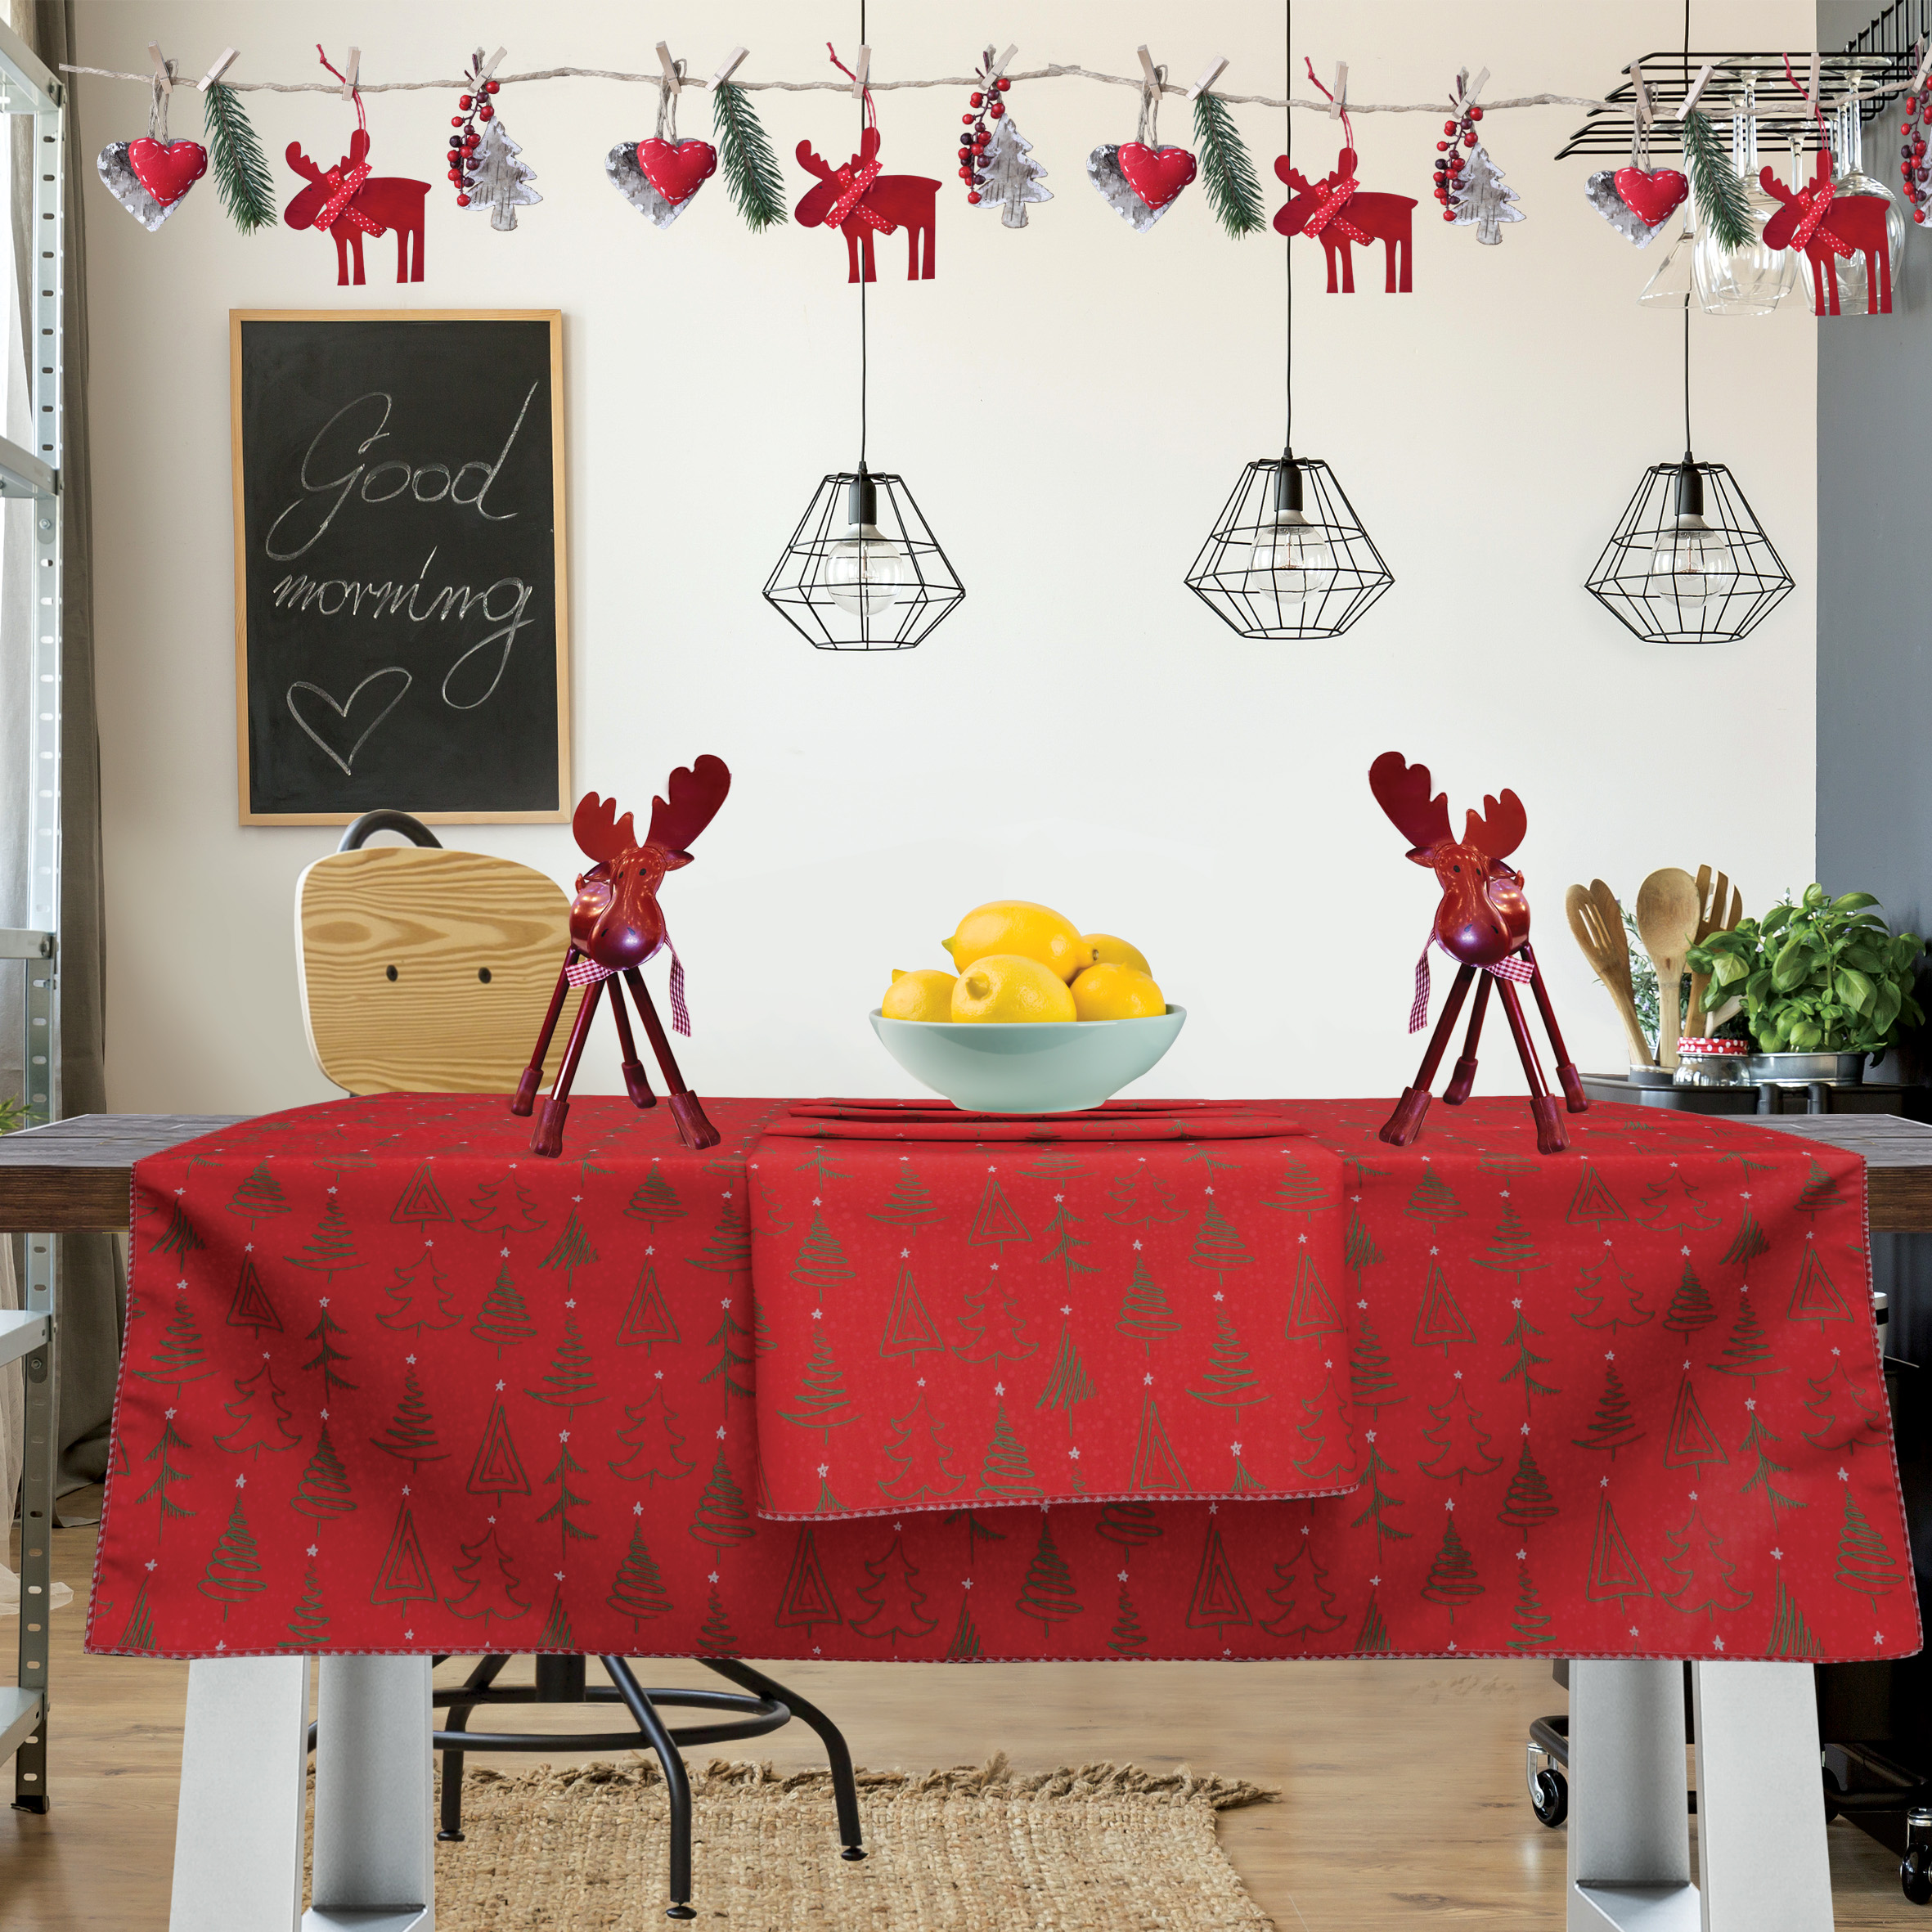 Runner CHRISTMAS LINE 550, DAS HOME εποχιακα ειδη   χριστουγεννιάτικη συλλογή   ράνερ   σουπλά χριστουγεννιάτικα